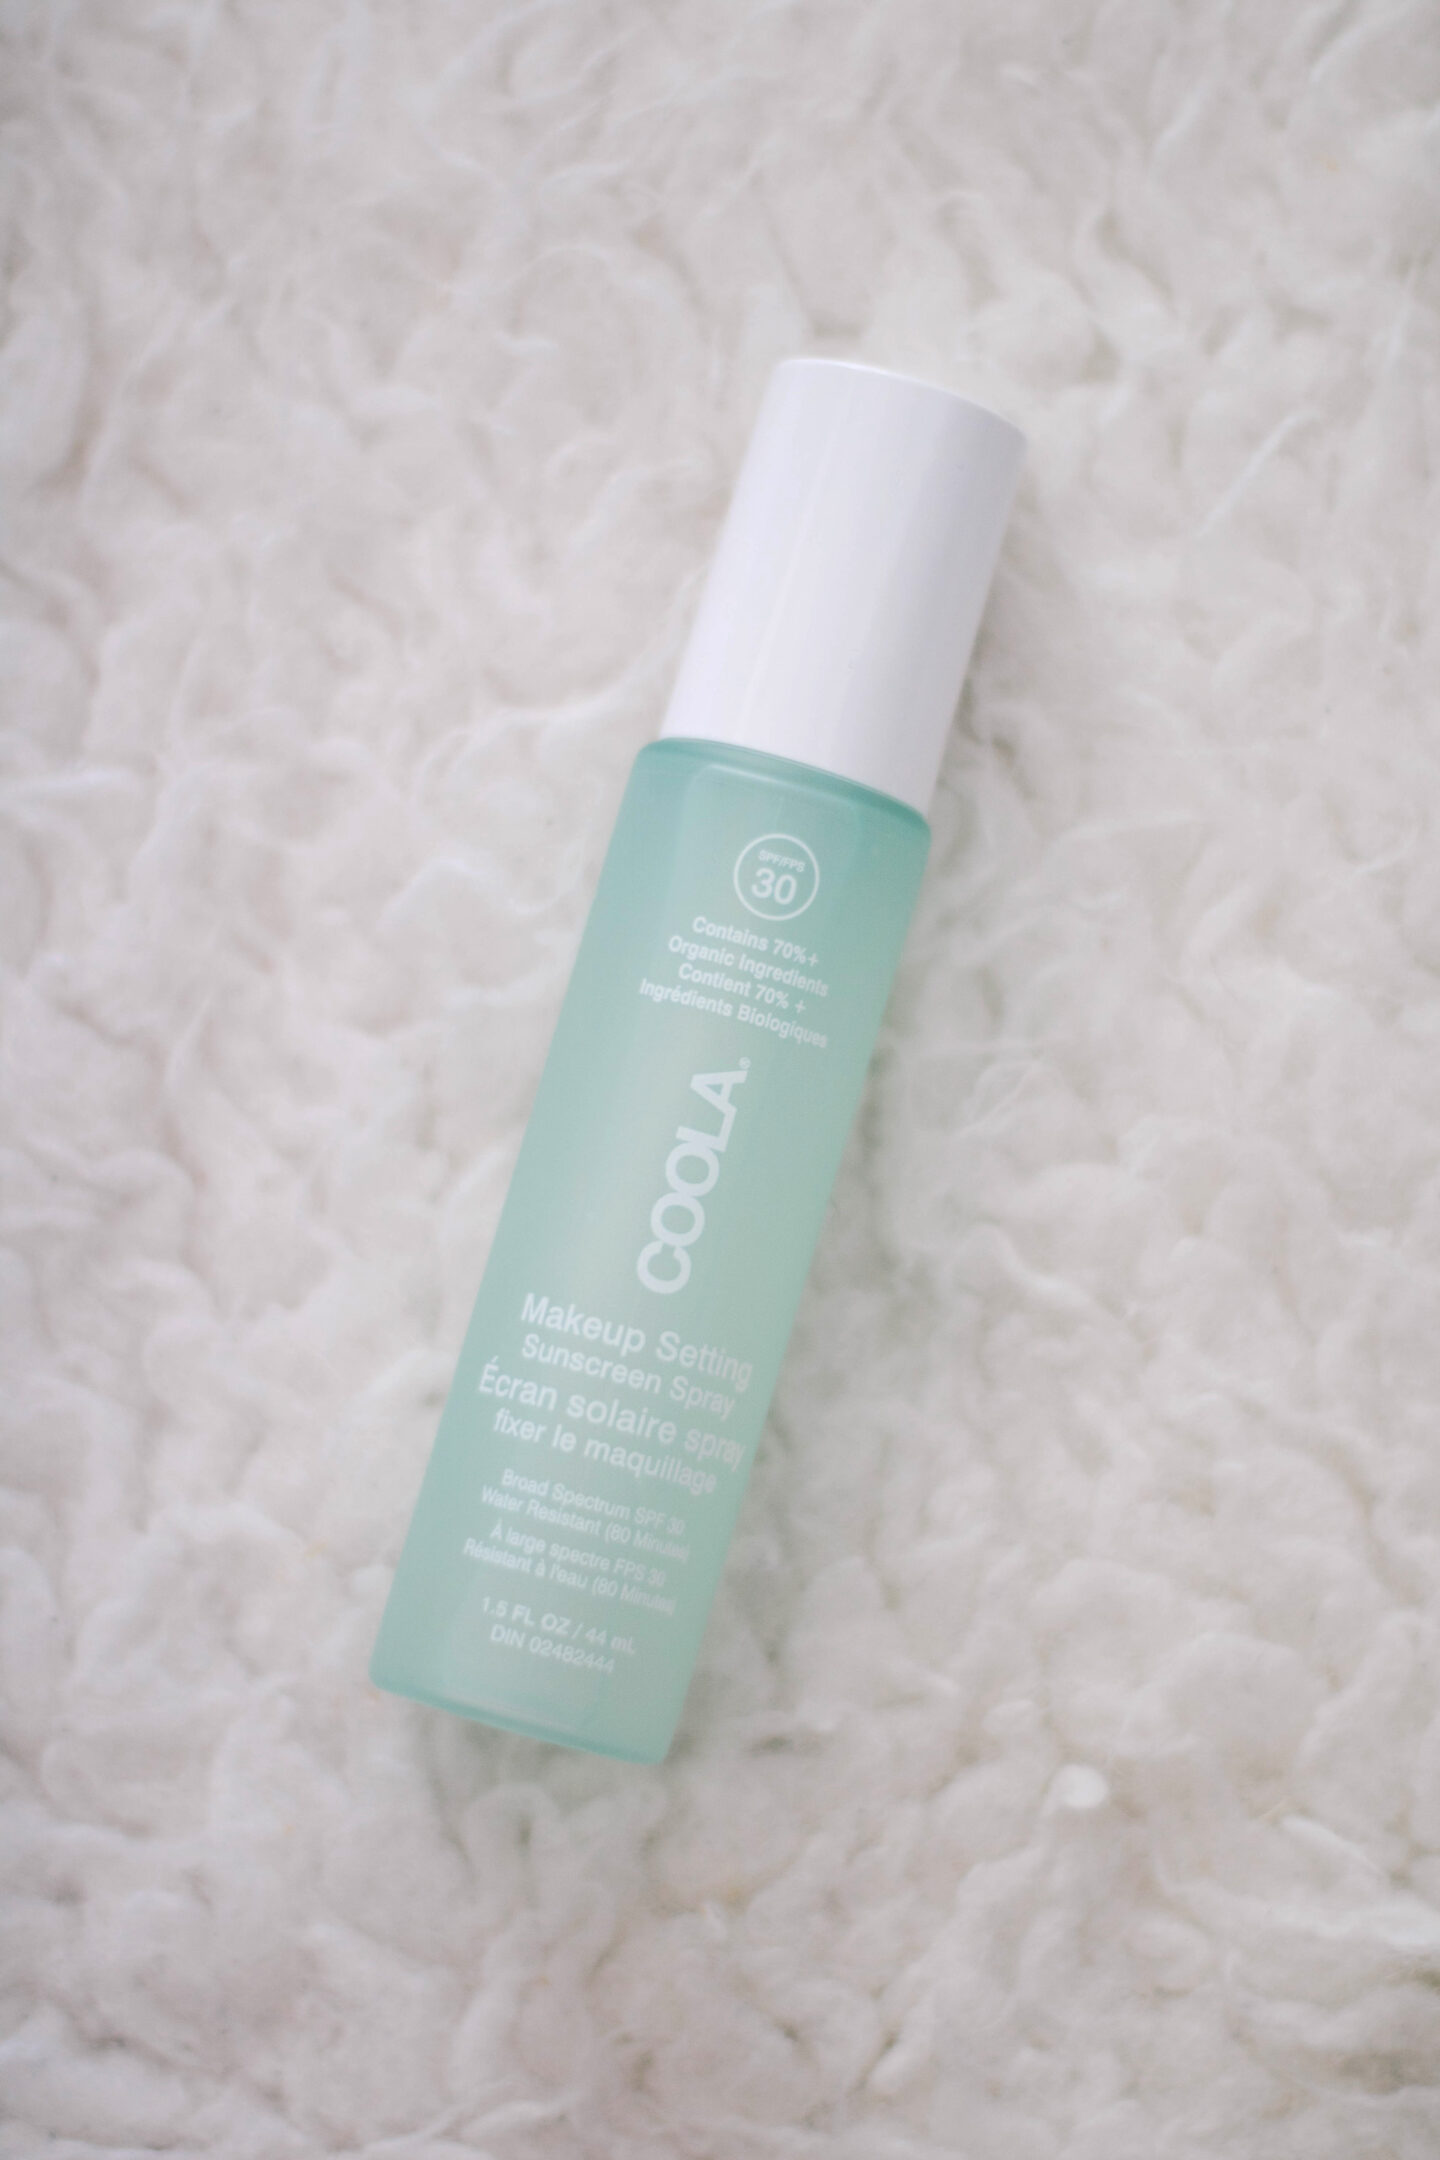 Coola SPF 30 Makeup Setting Spray - Beautysense Canada review